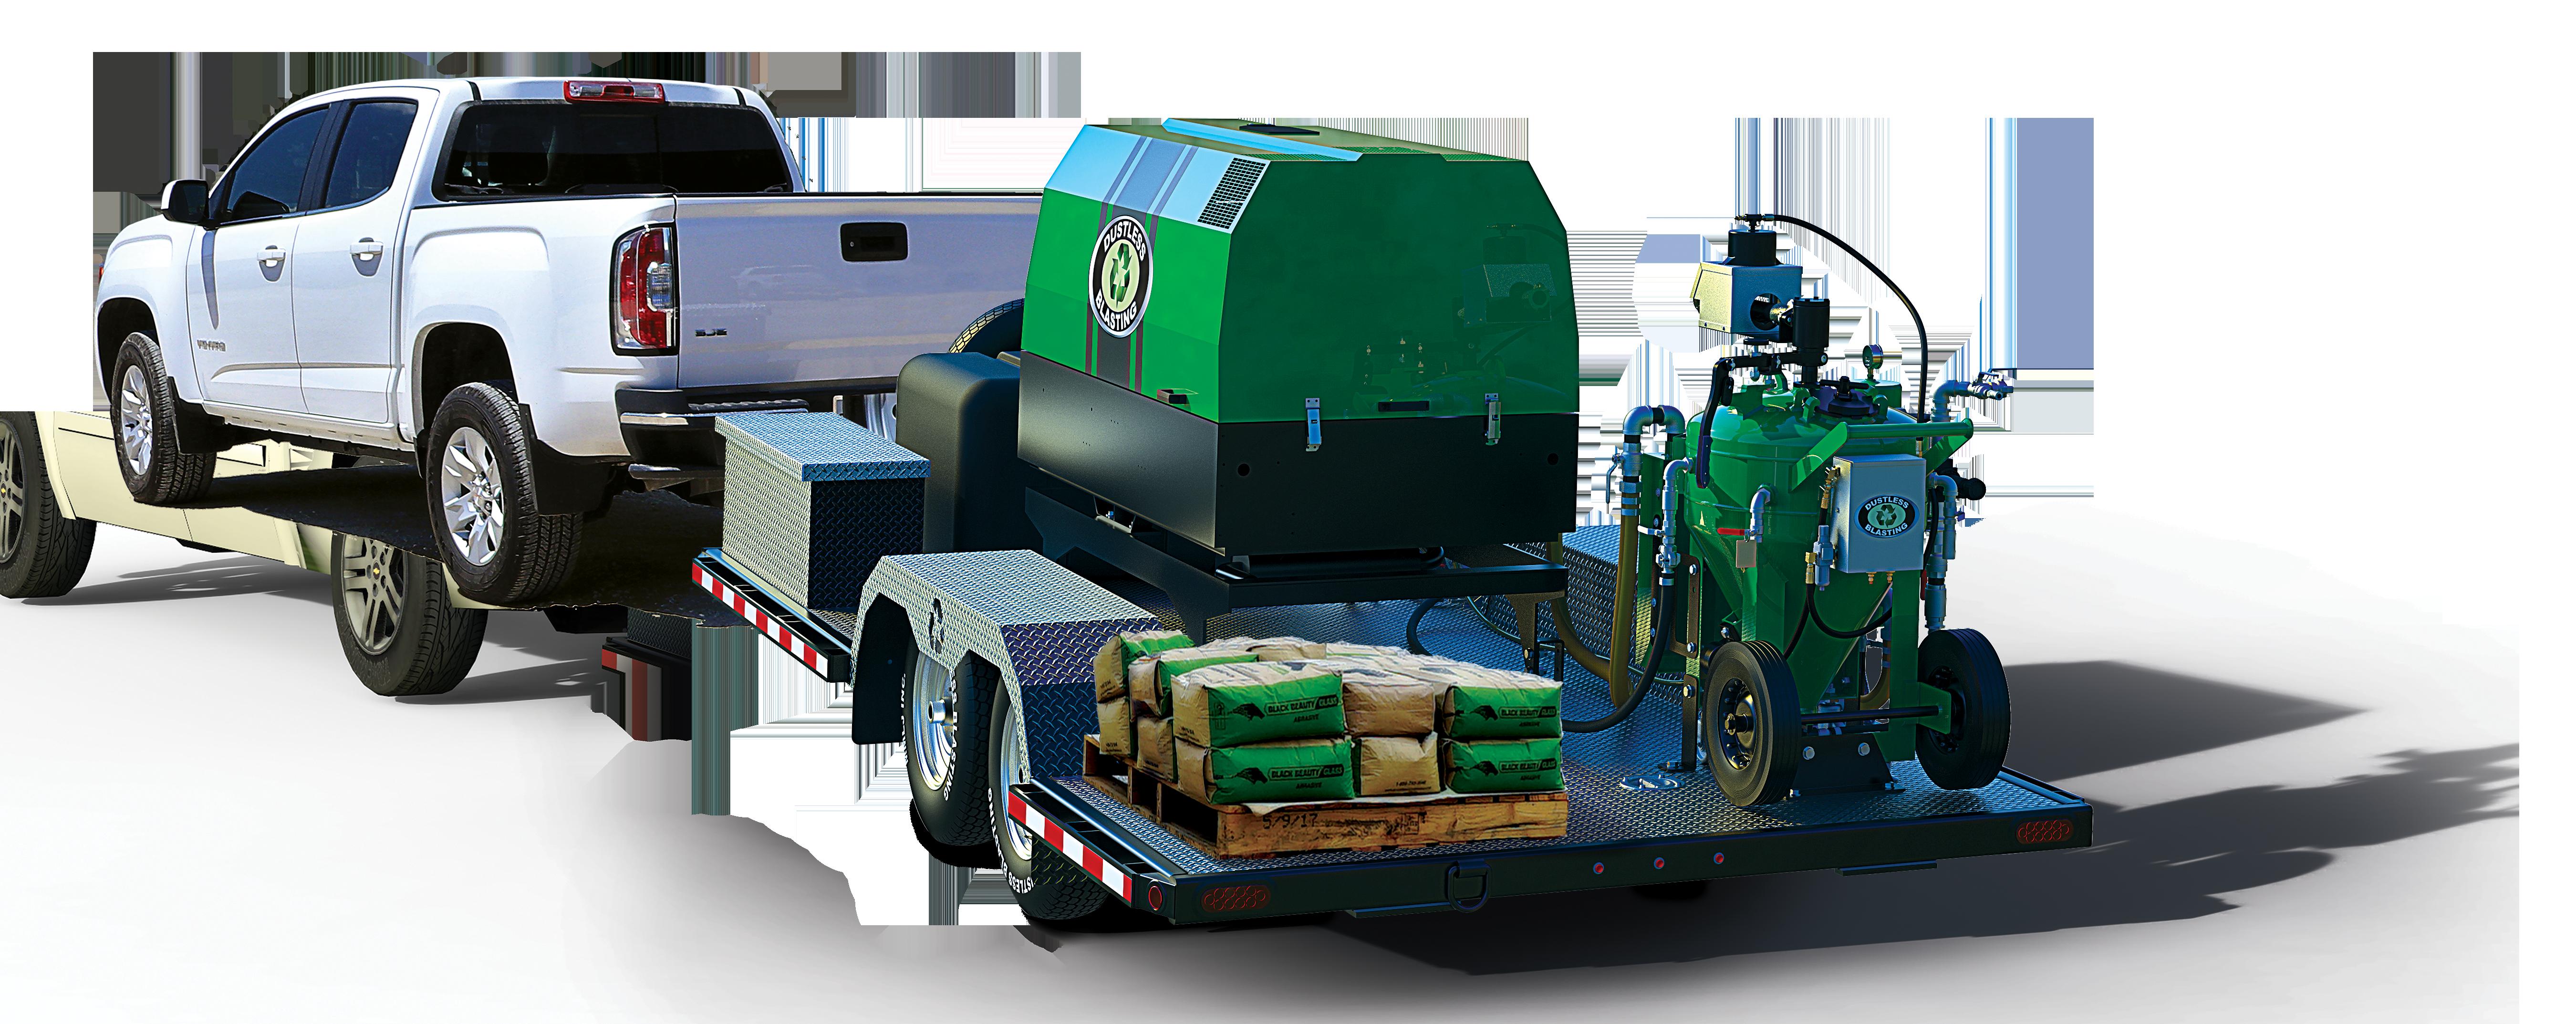 truck-xl-render